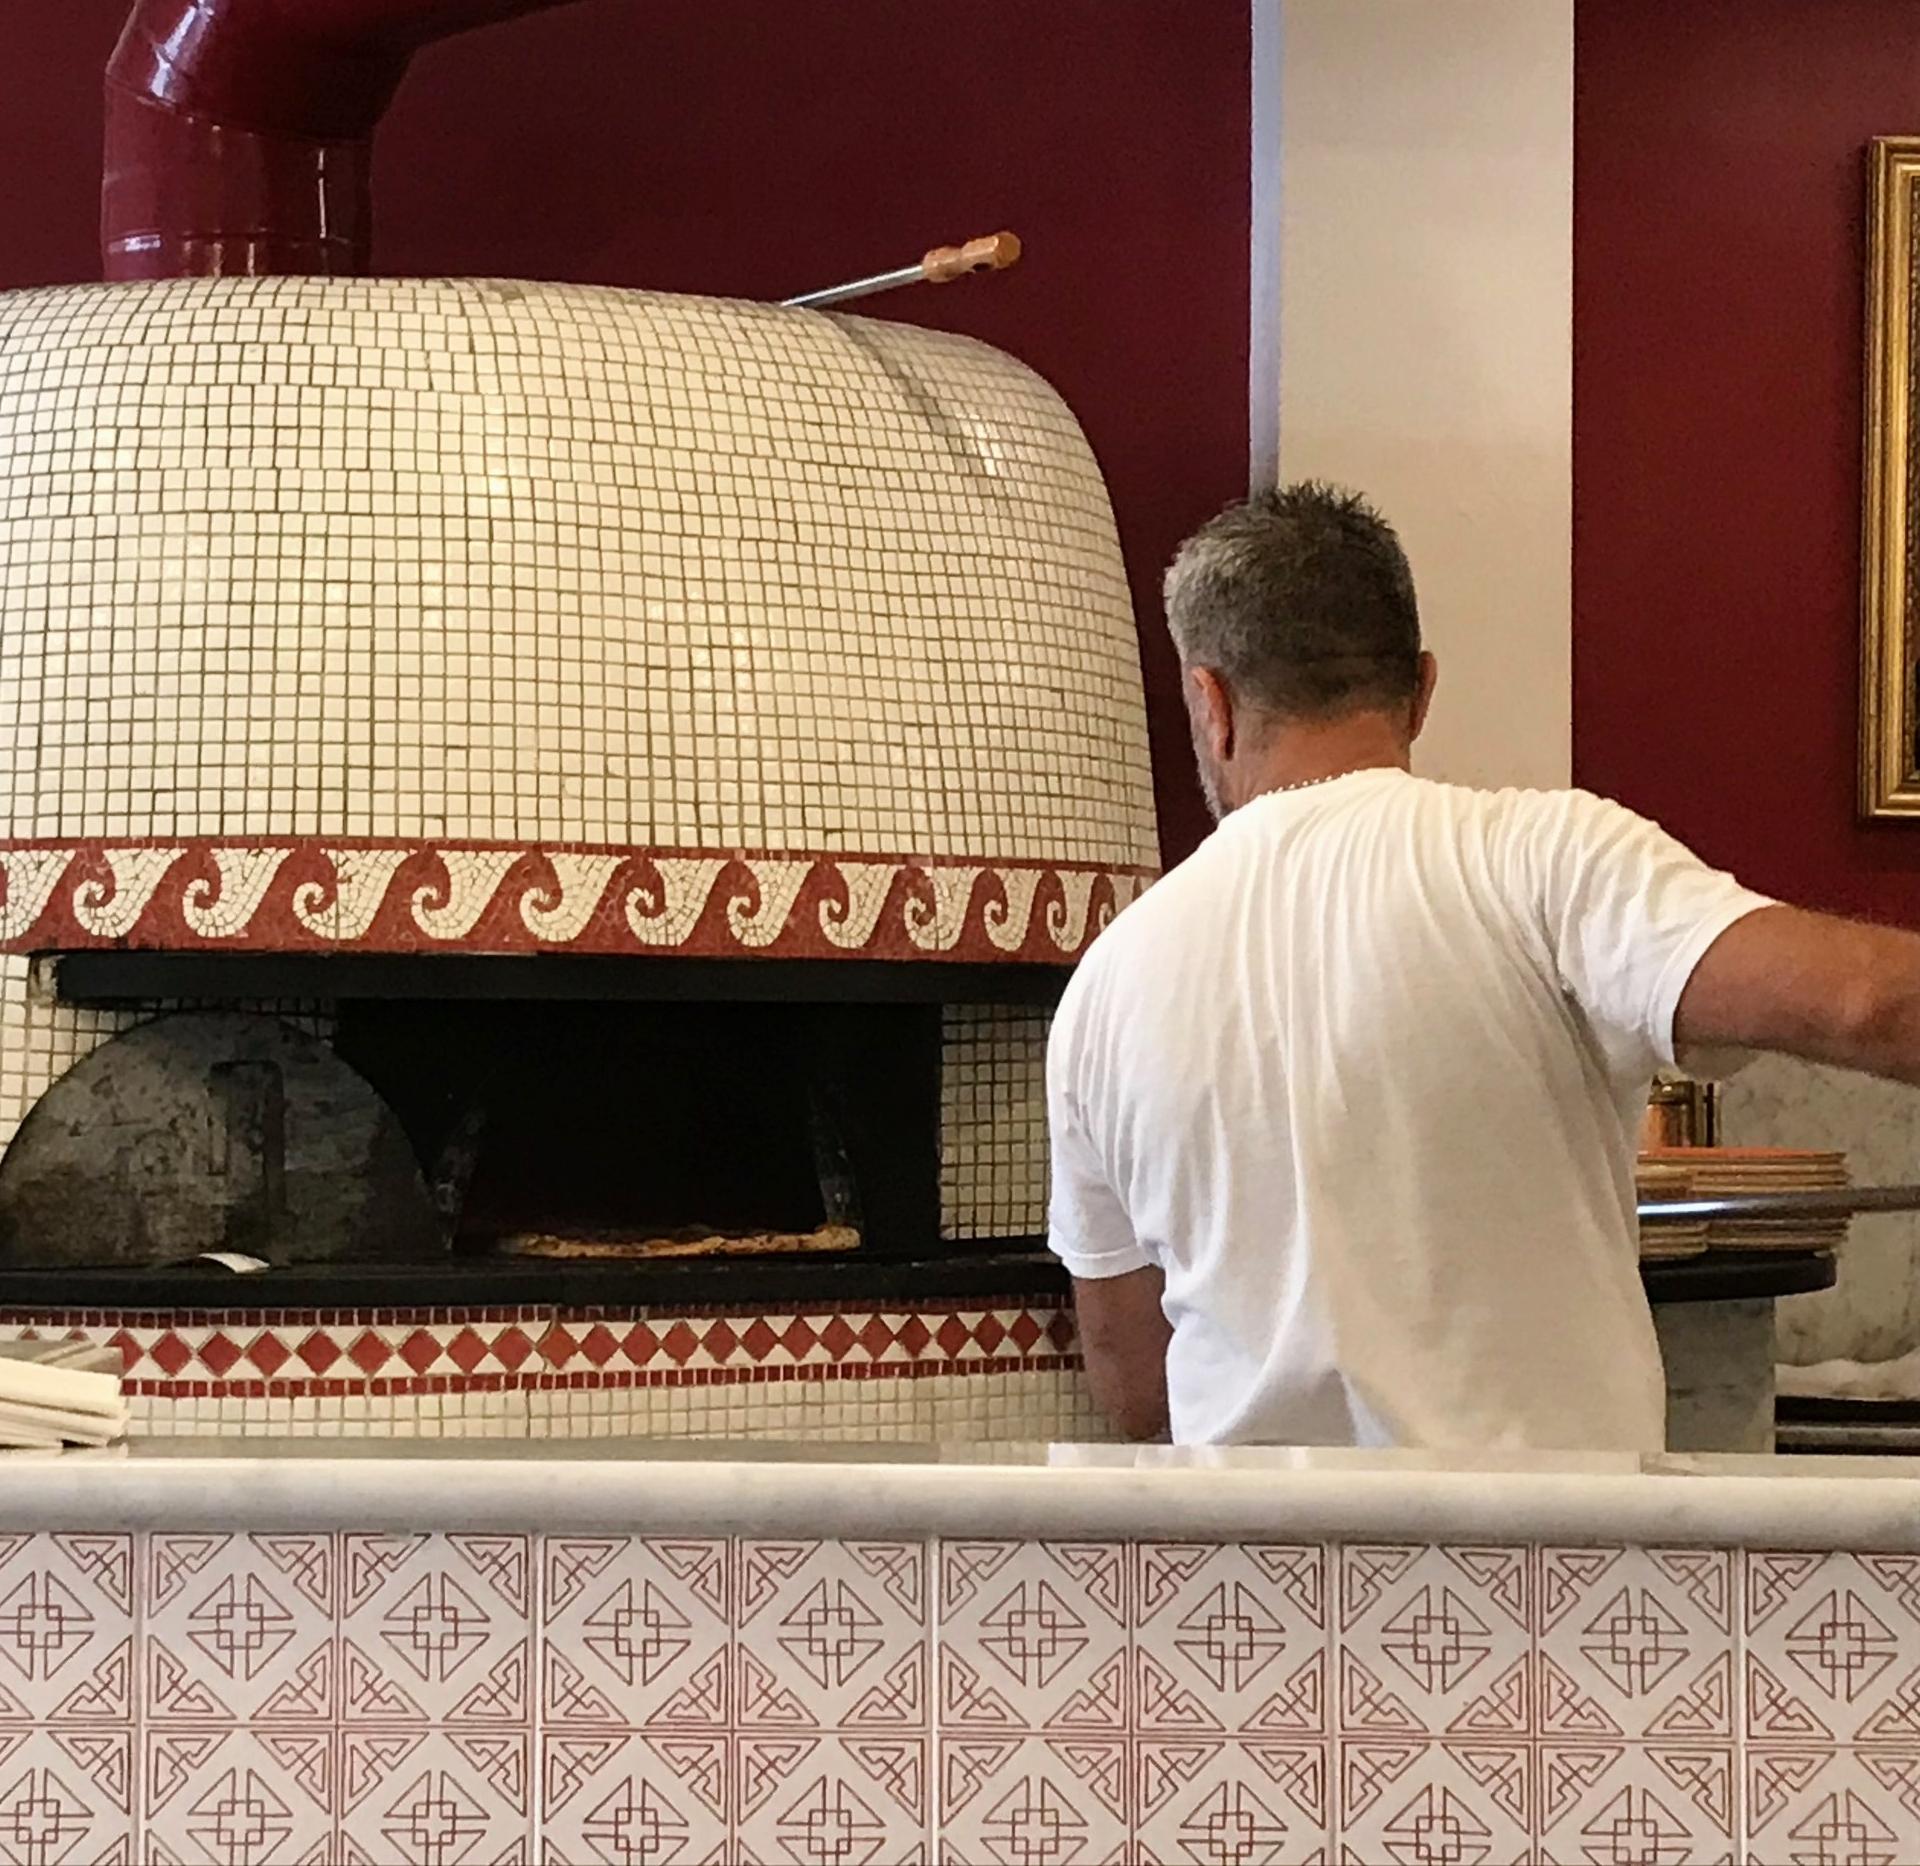 The pizza artist at work, Santa Maria, Italy.